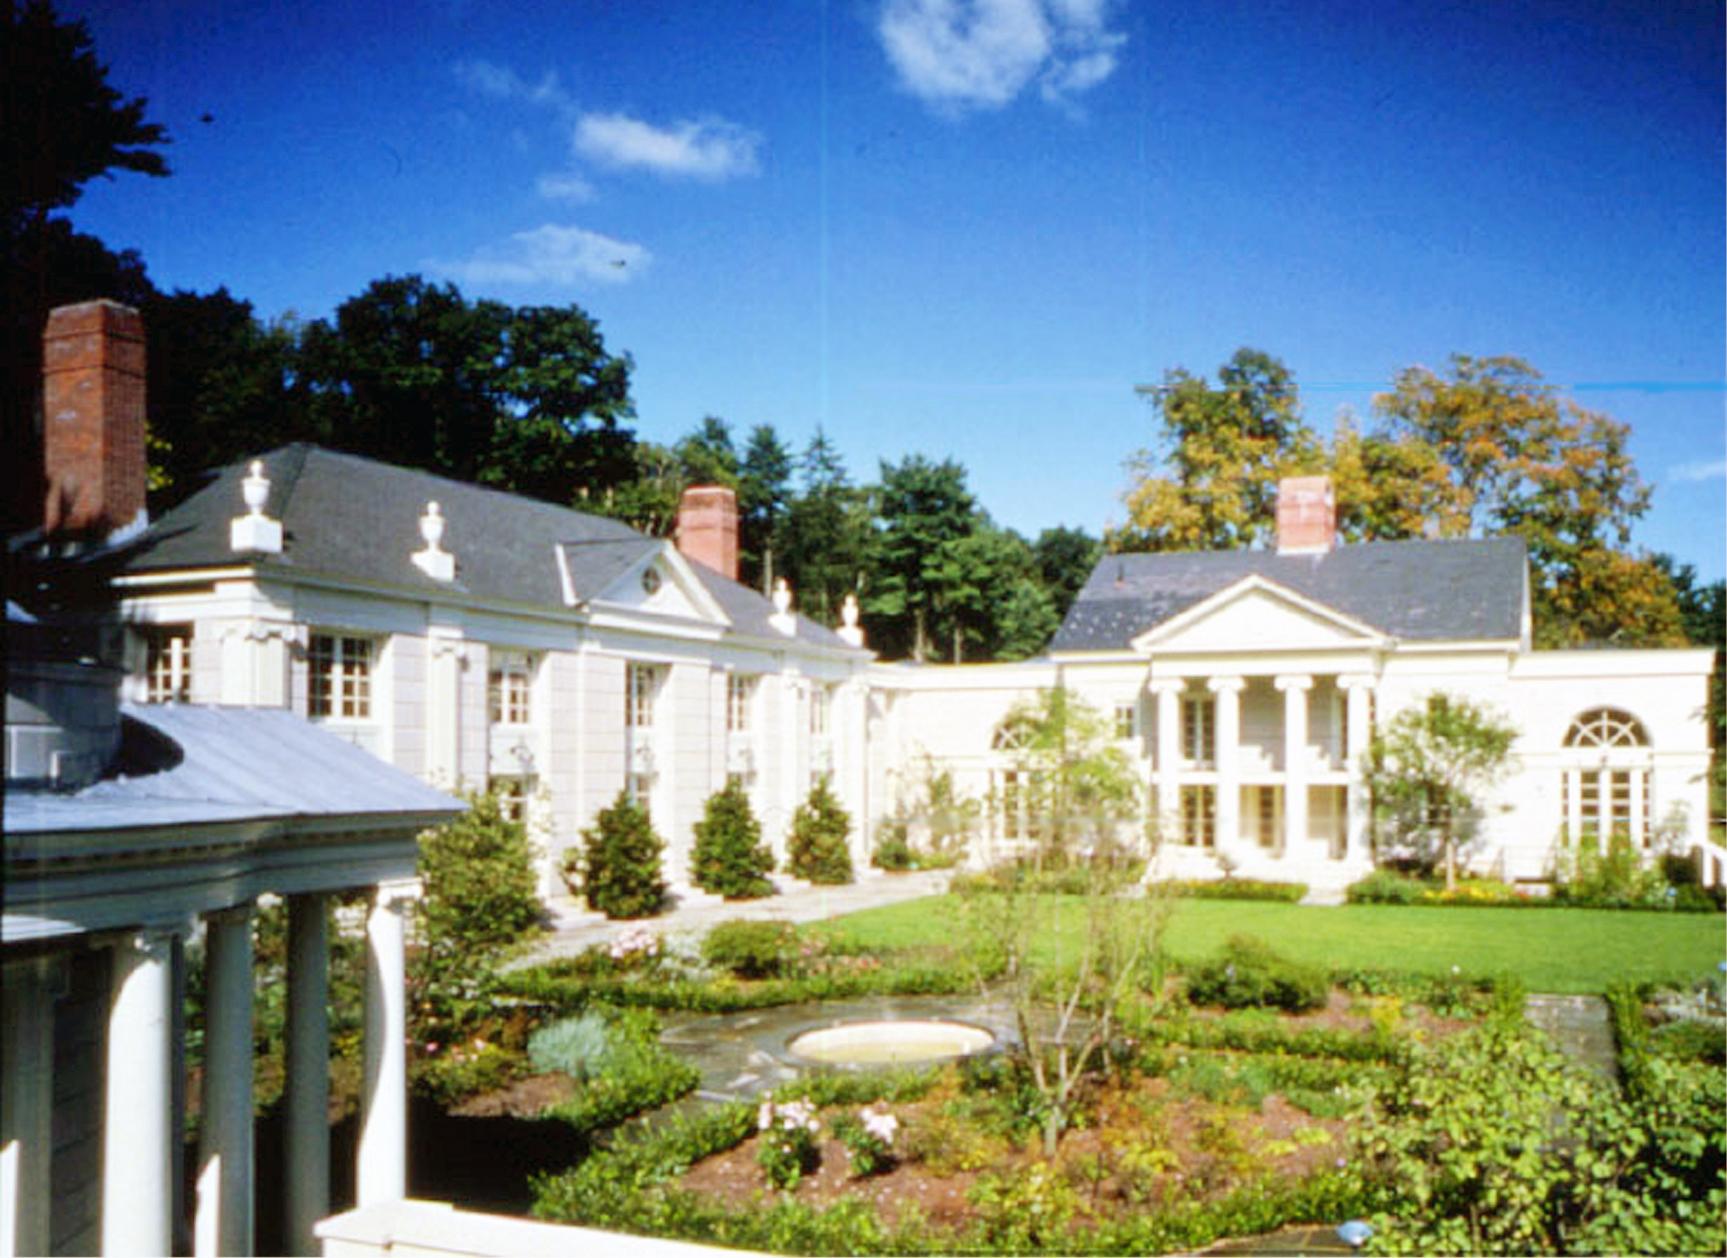 Lyme.Connecticut.Taylor_House.House_&_Garden.Robert_Orr_&_Associates.Architecture.Landscape_Architecture.New_Urbanism.Rear_Courtyard.jpg